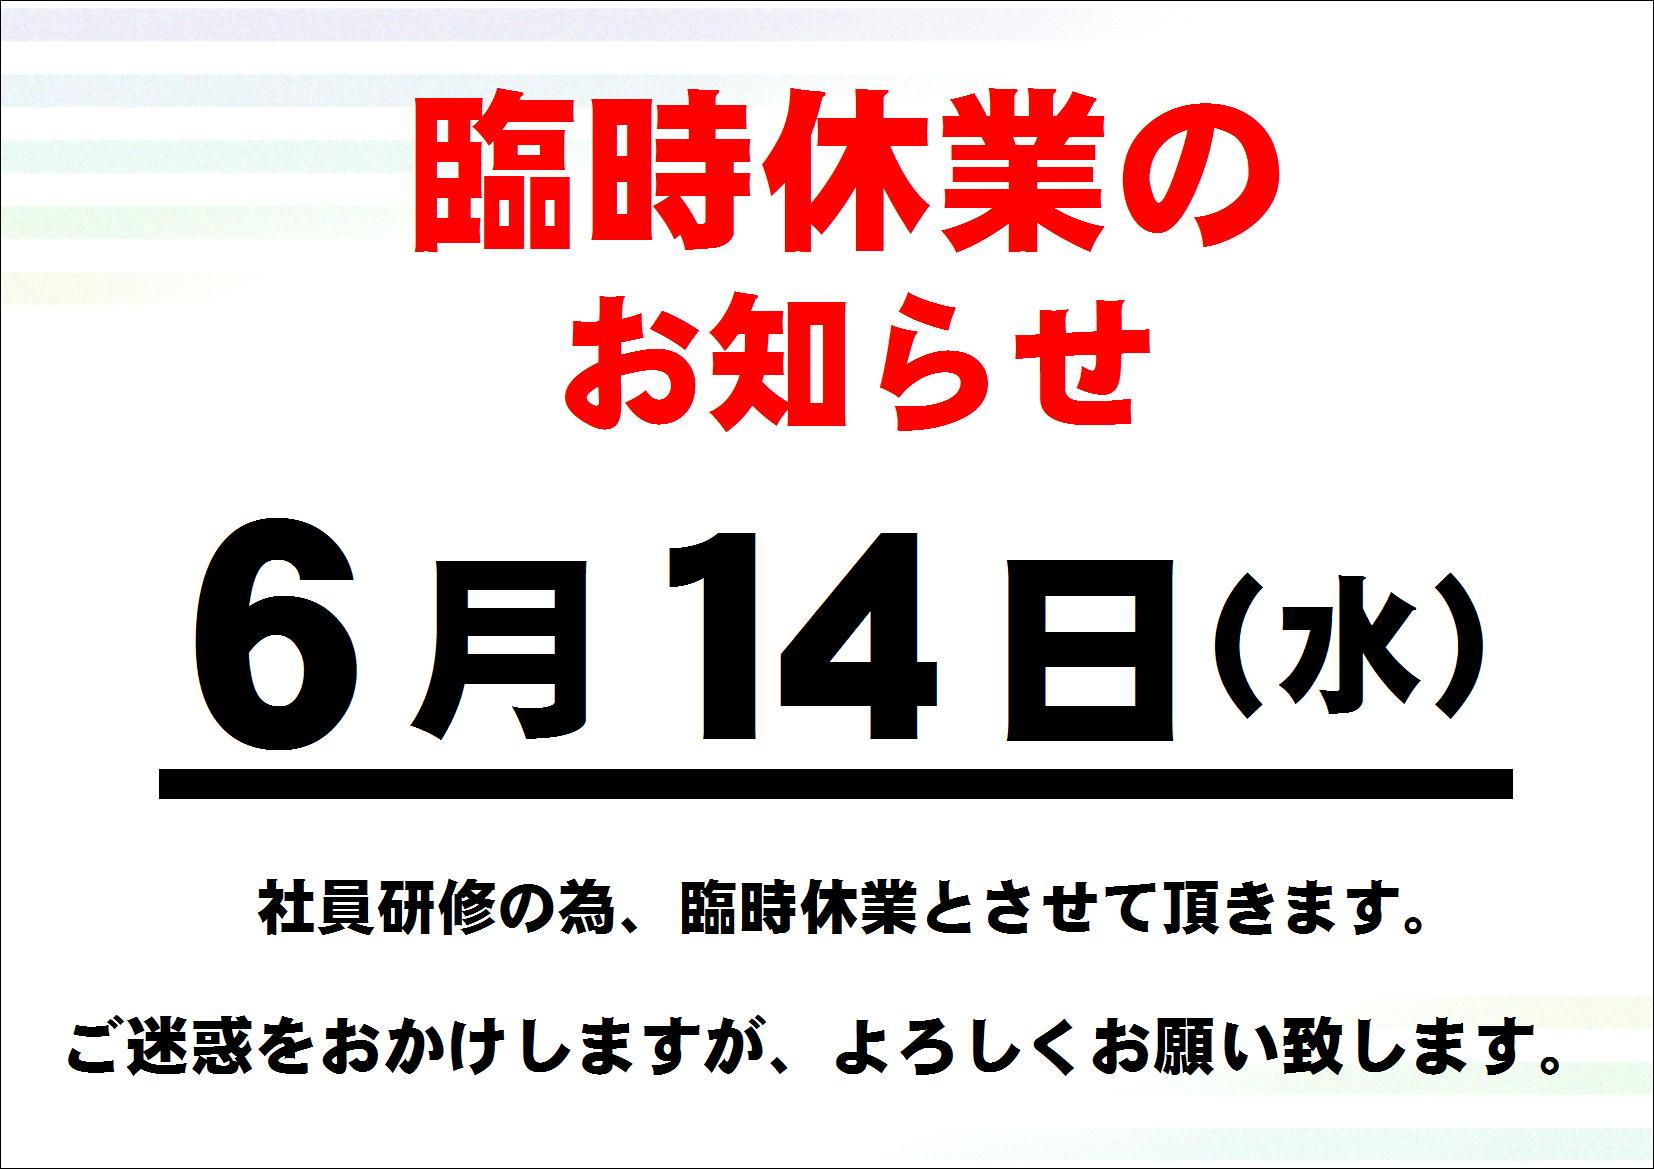 http://www.playsports.jp/news/images/%E8%87%A8%E6%99%82%E4%BC%91%E6%A5%AD.JPG